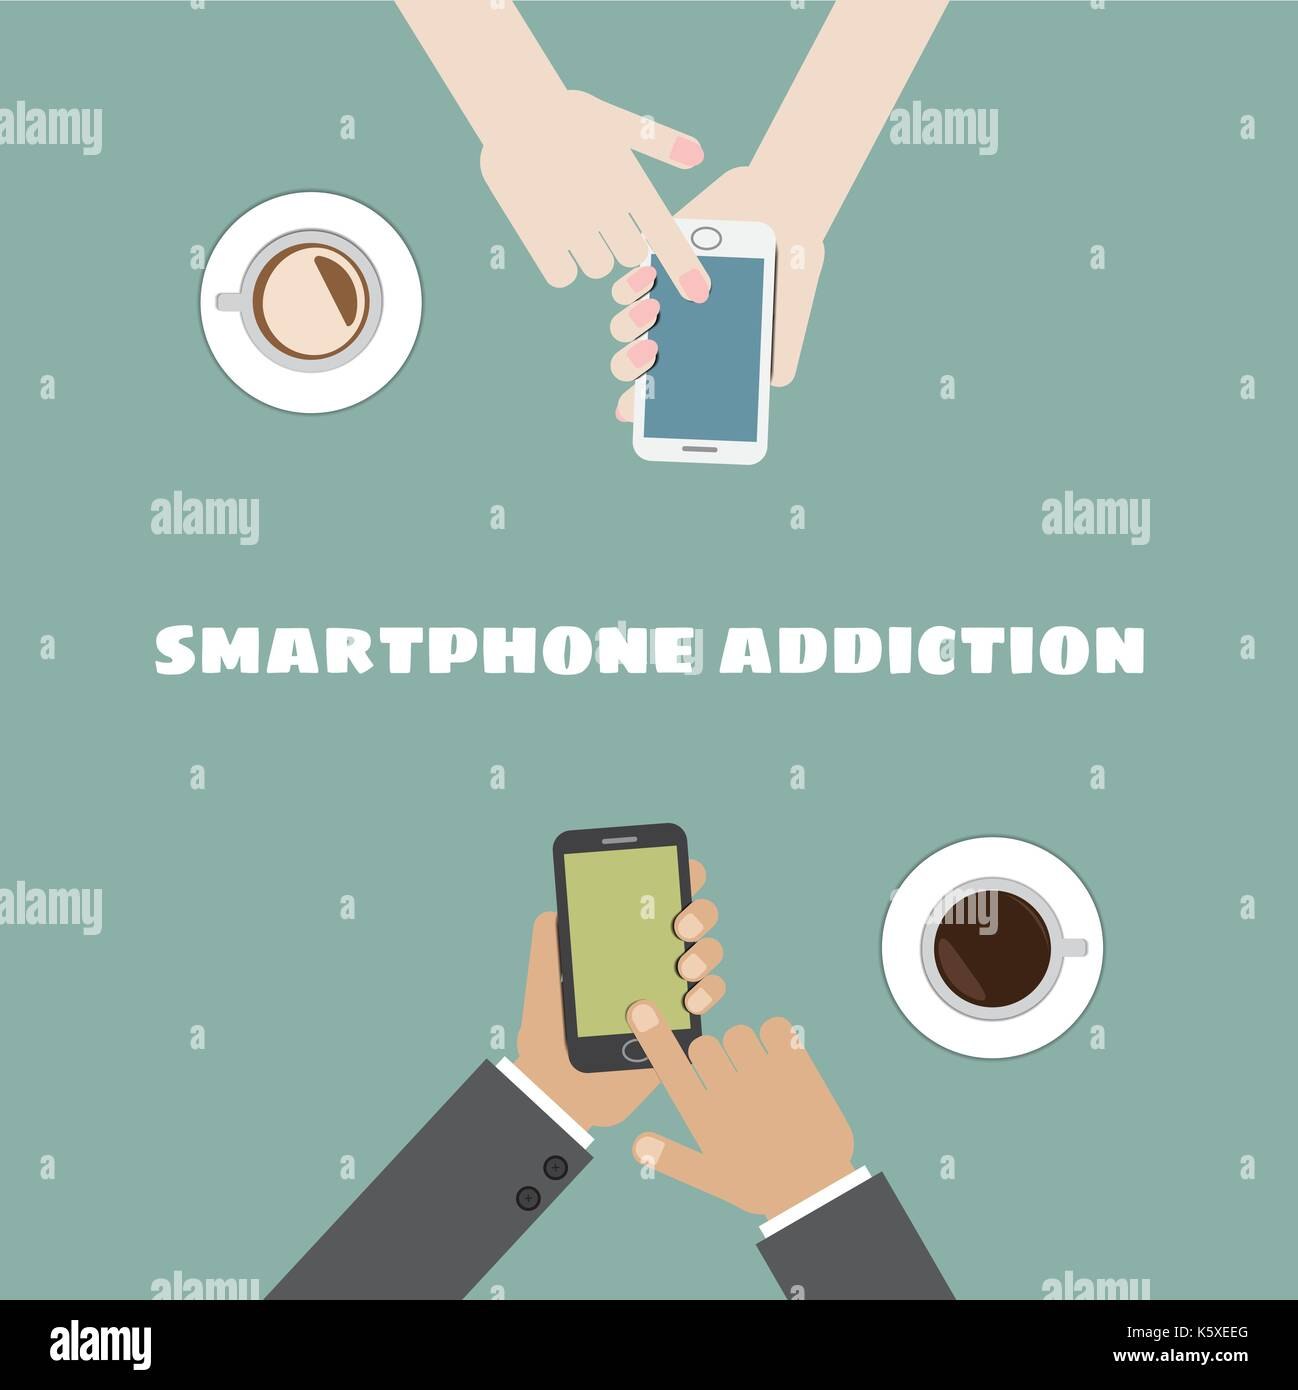 smartphone addiction - Stock Image